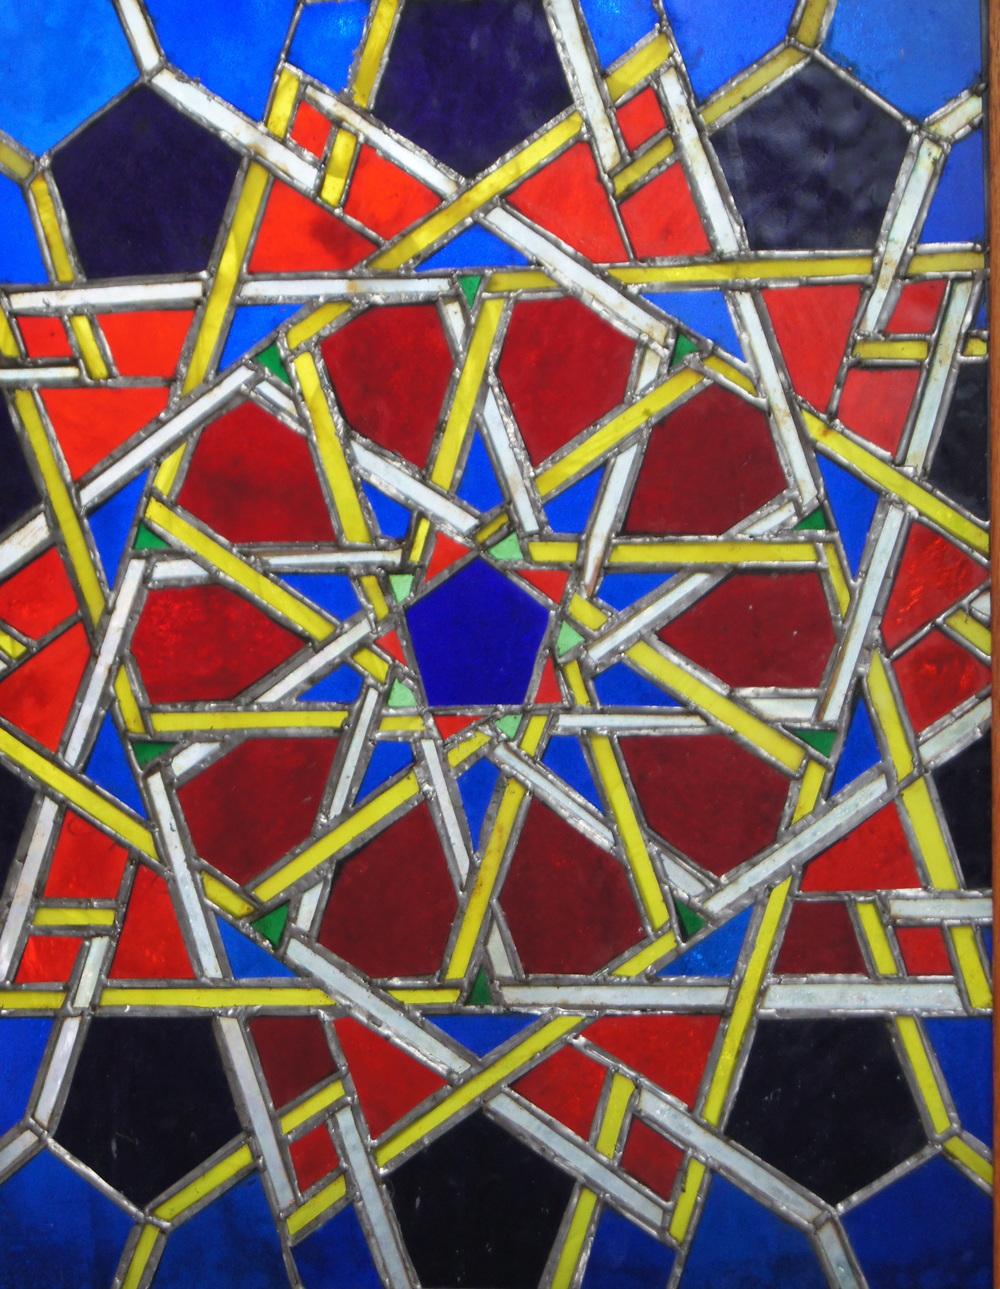 stained_glass__pentagonsDSC03864 2-18-2013 12-29-23 PM 2777x3579.JPG